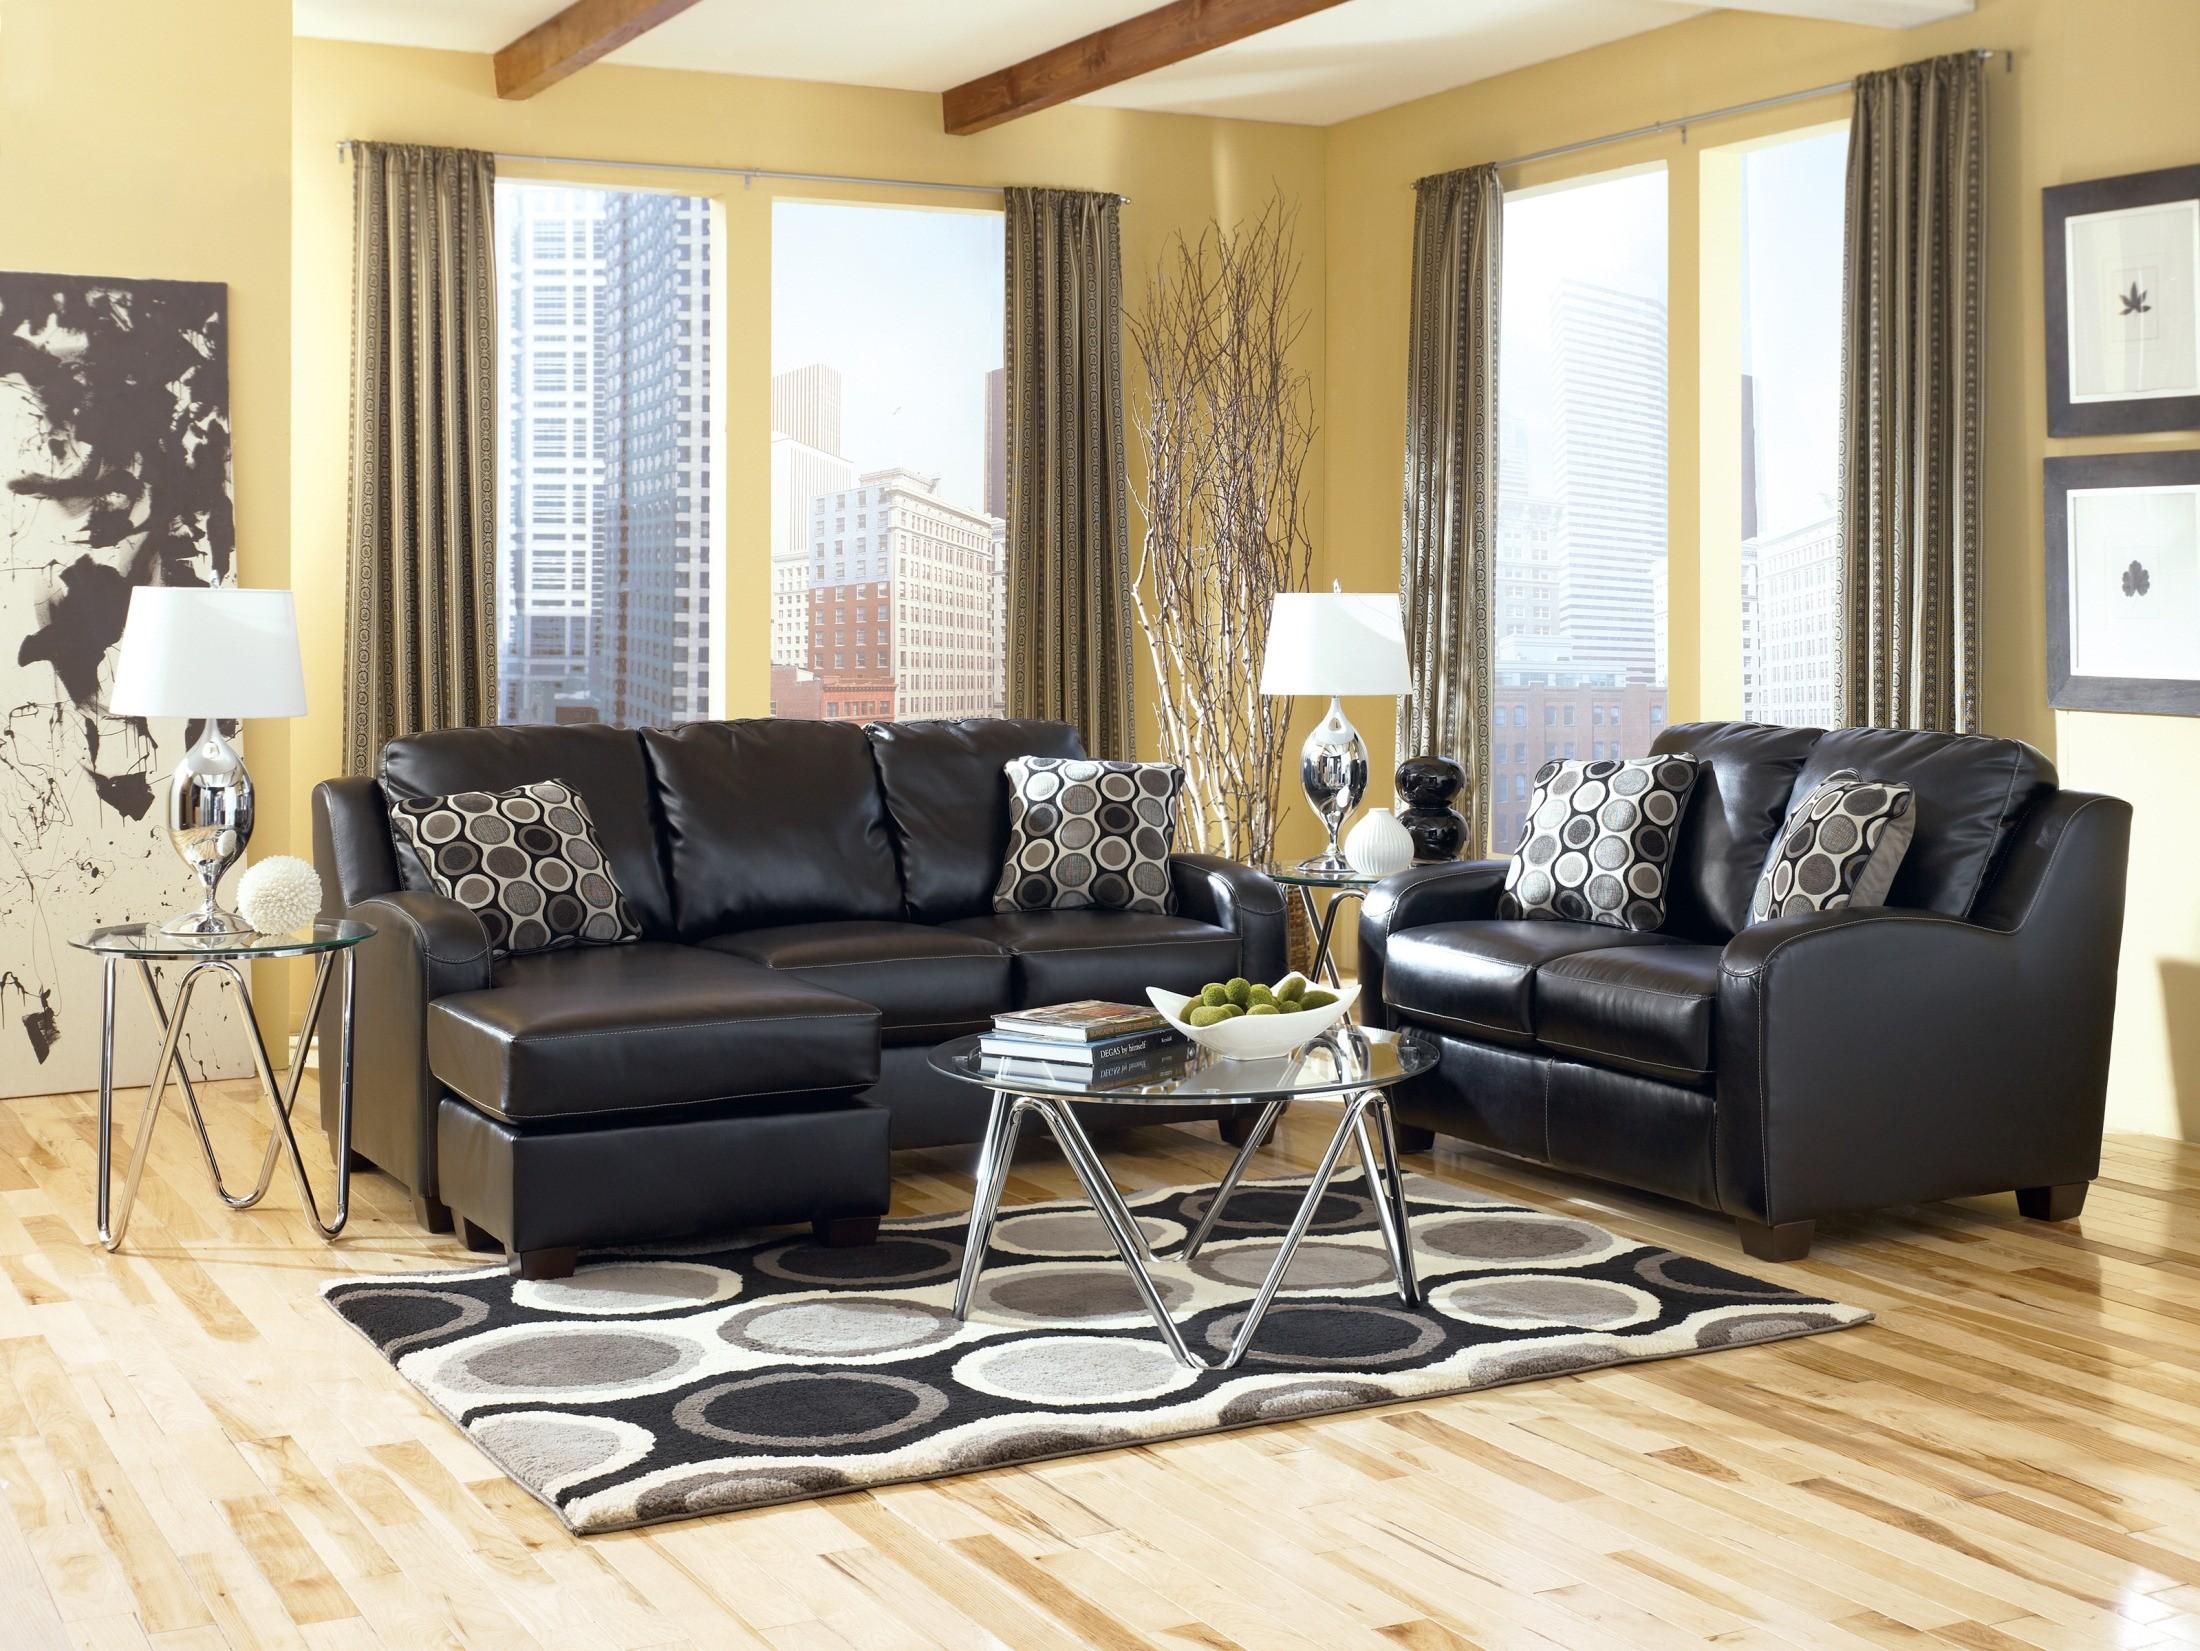 Ashley furniture devin durablend black sofa chaise queen for Ashley durablend chaise